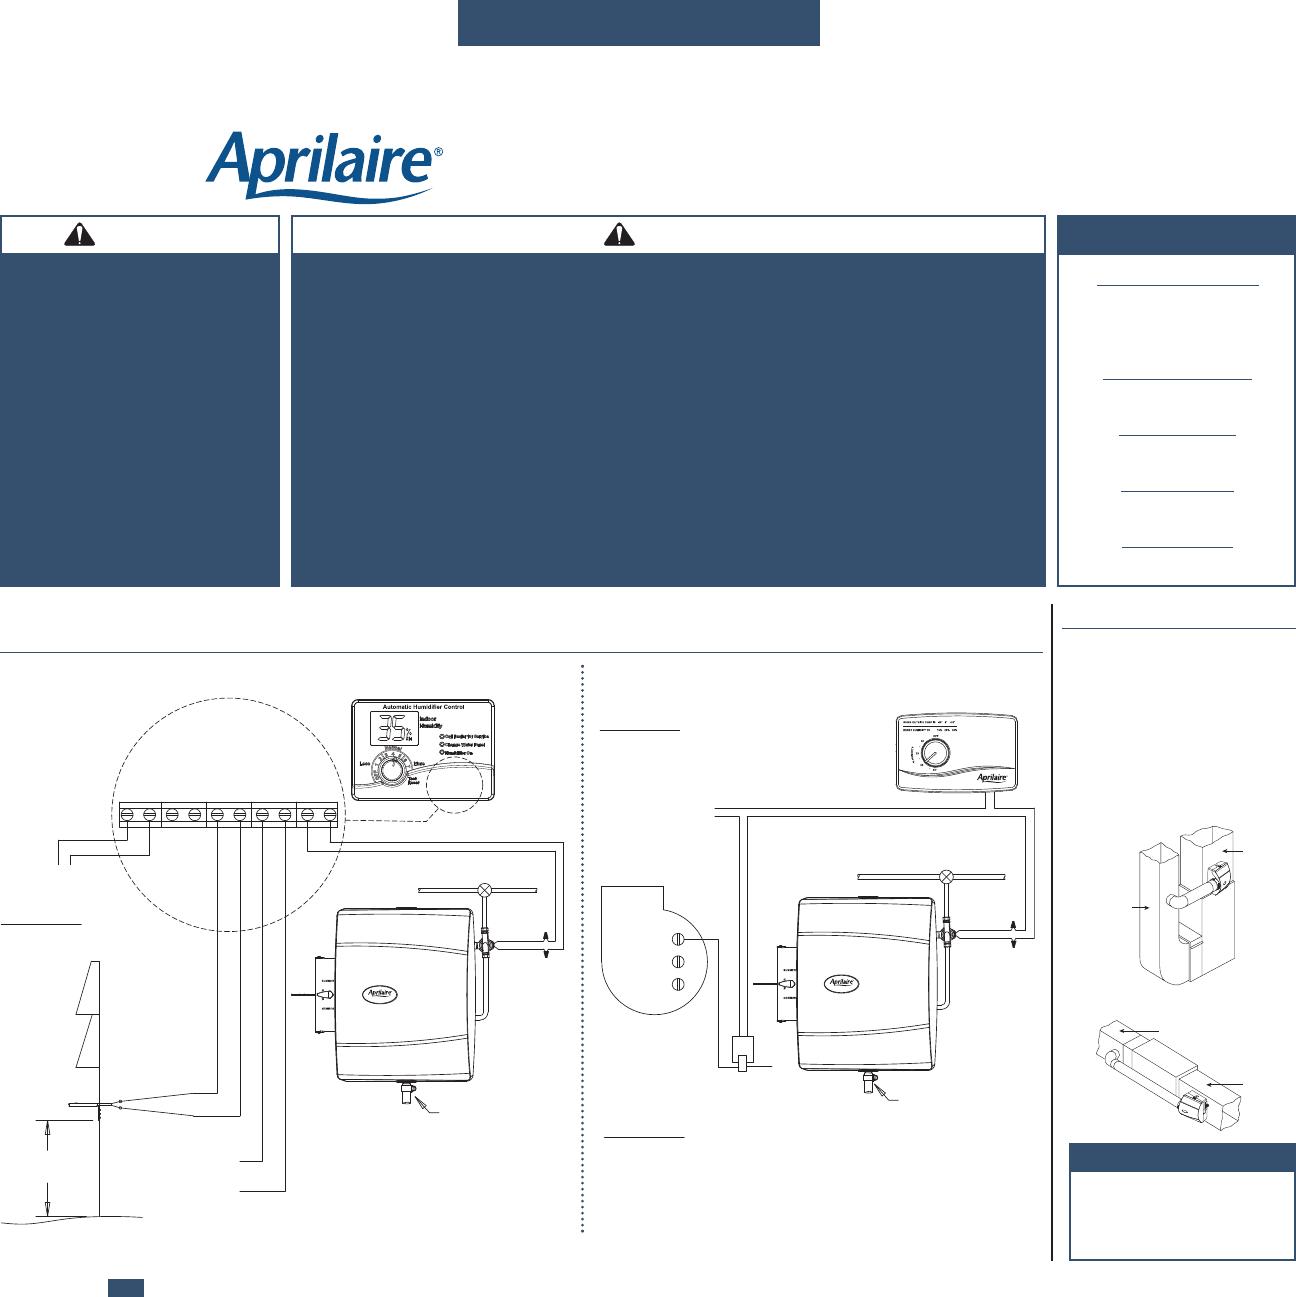 Aprilaire Humidifier Wiring Manual - Custom Wiring Diagram •